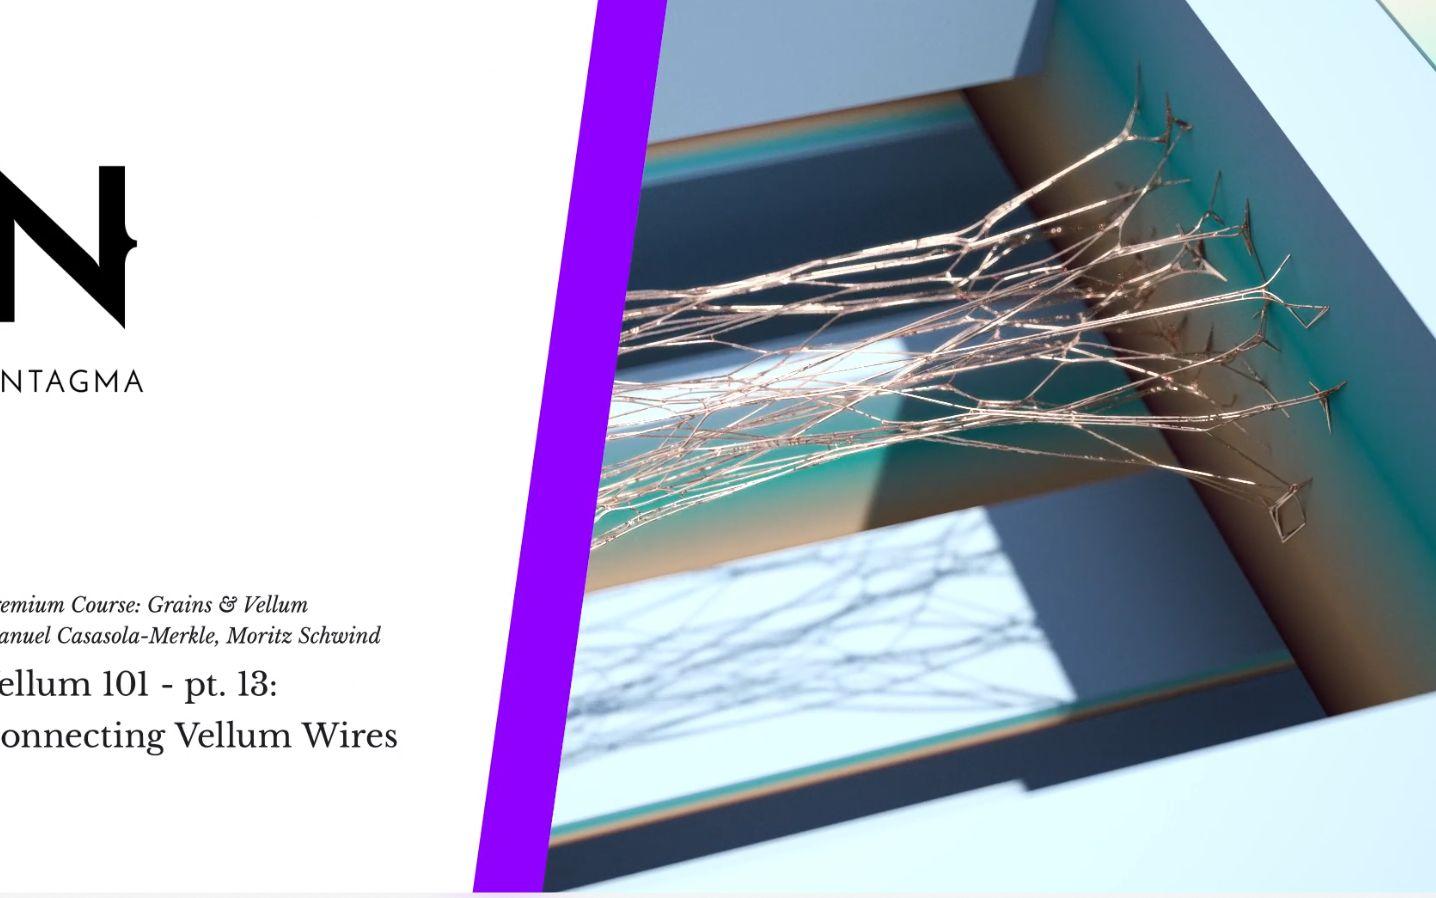 【Houdini】Vellum Connecting Wires_哔哩哔哩 (゜-゜)つロ 干杯~-bilibili